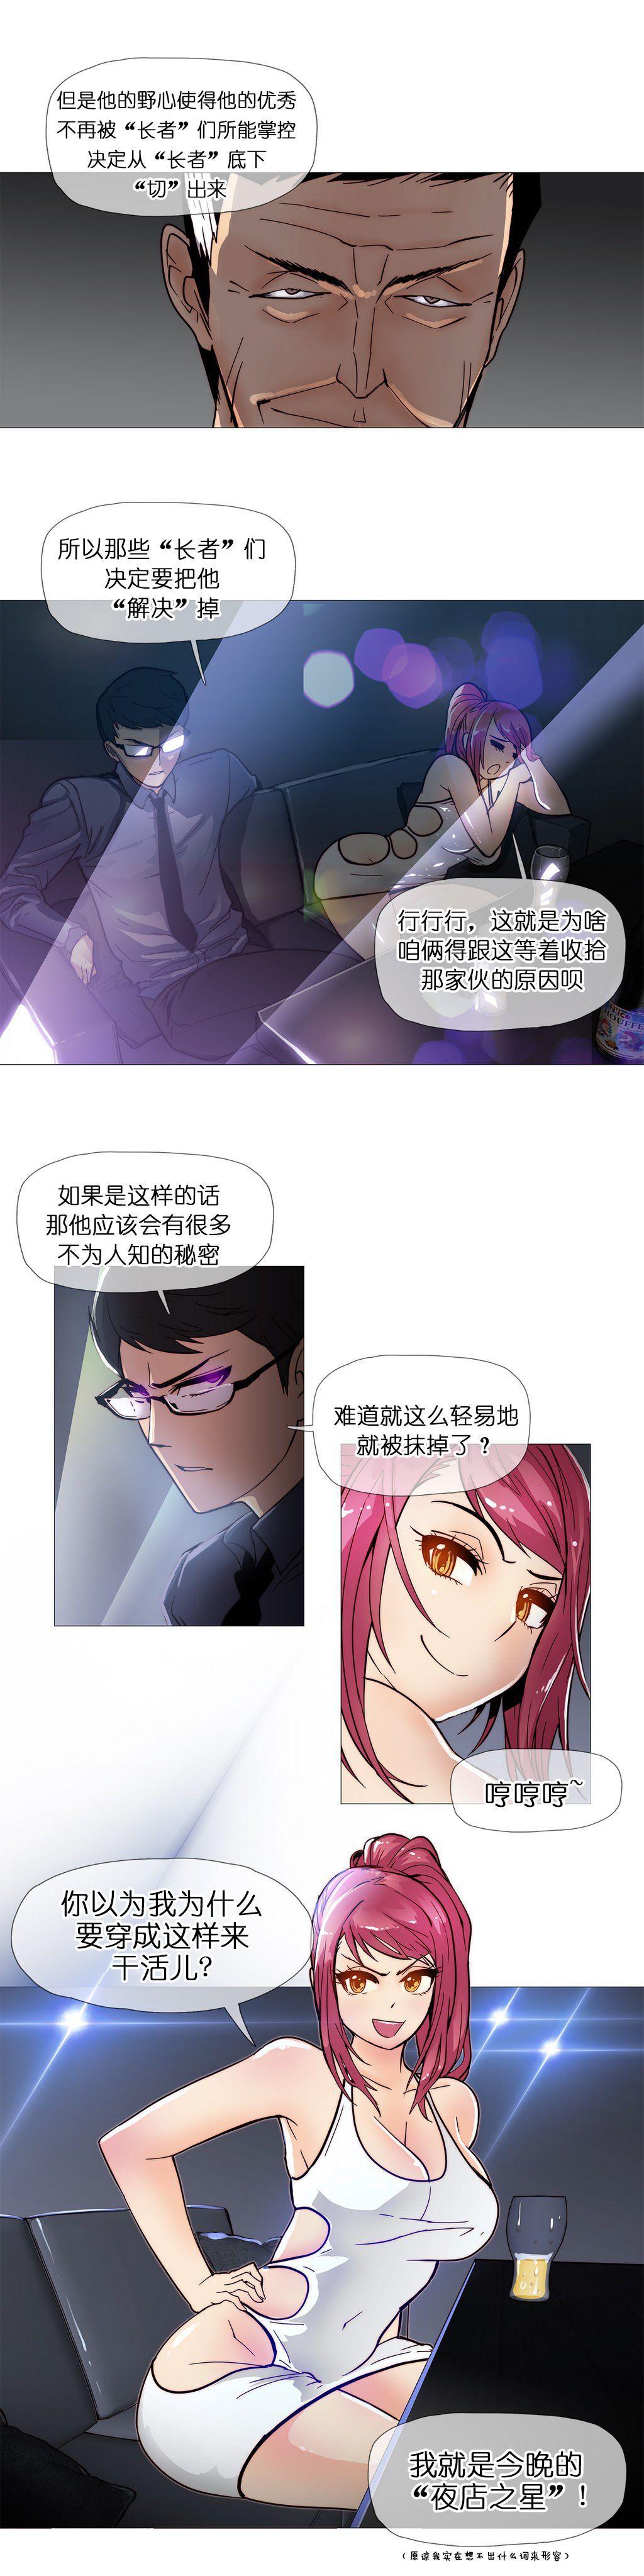 HouseHold Affairs 【卞赤鲤个人汉化】1~21话(持续更新中) 179